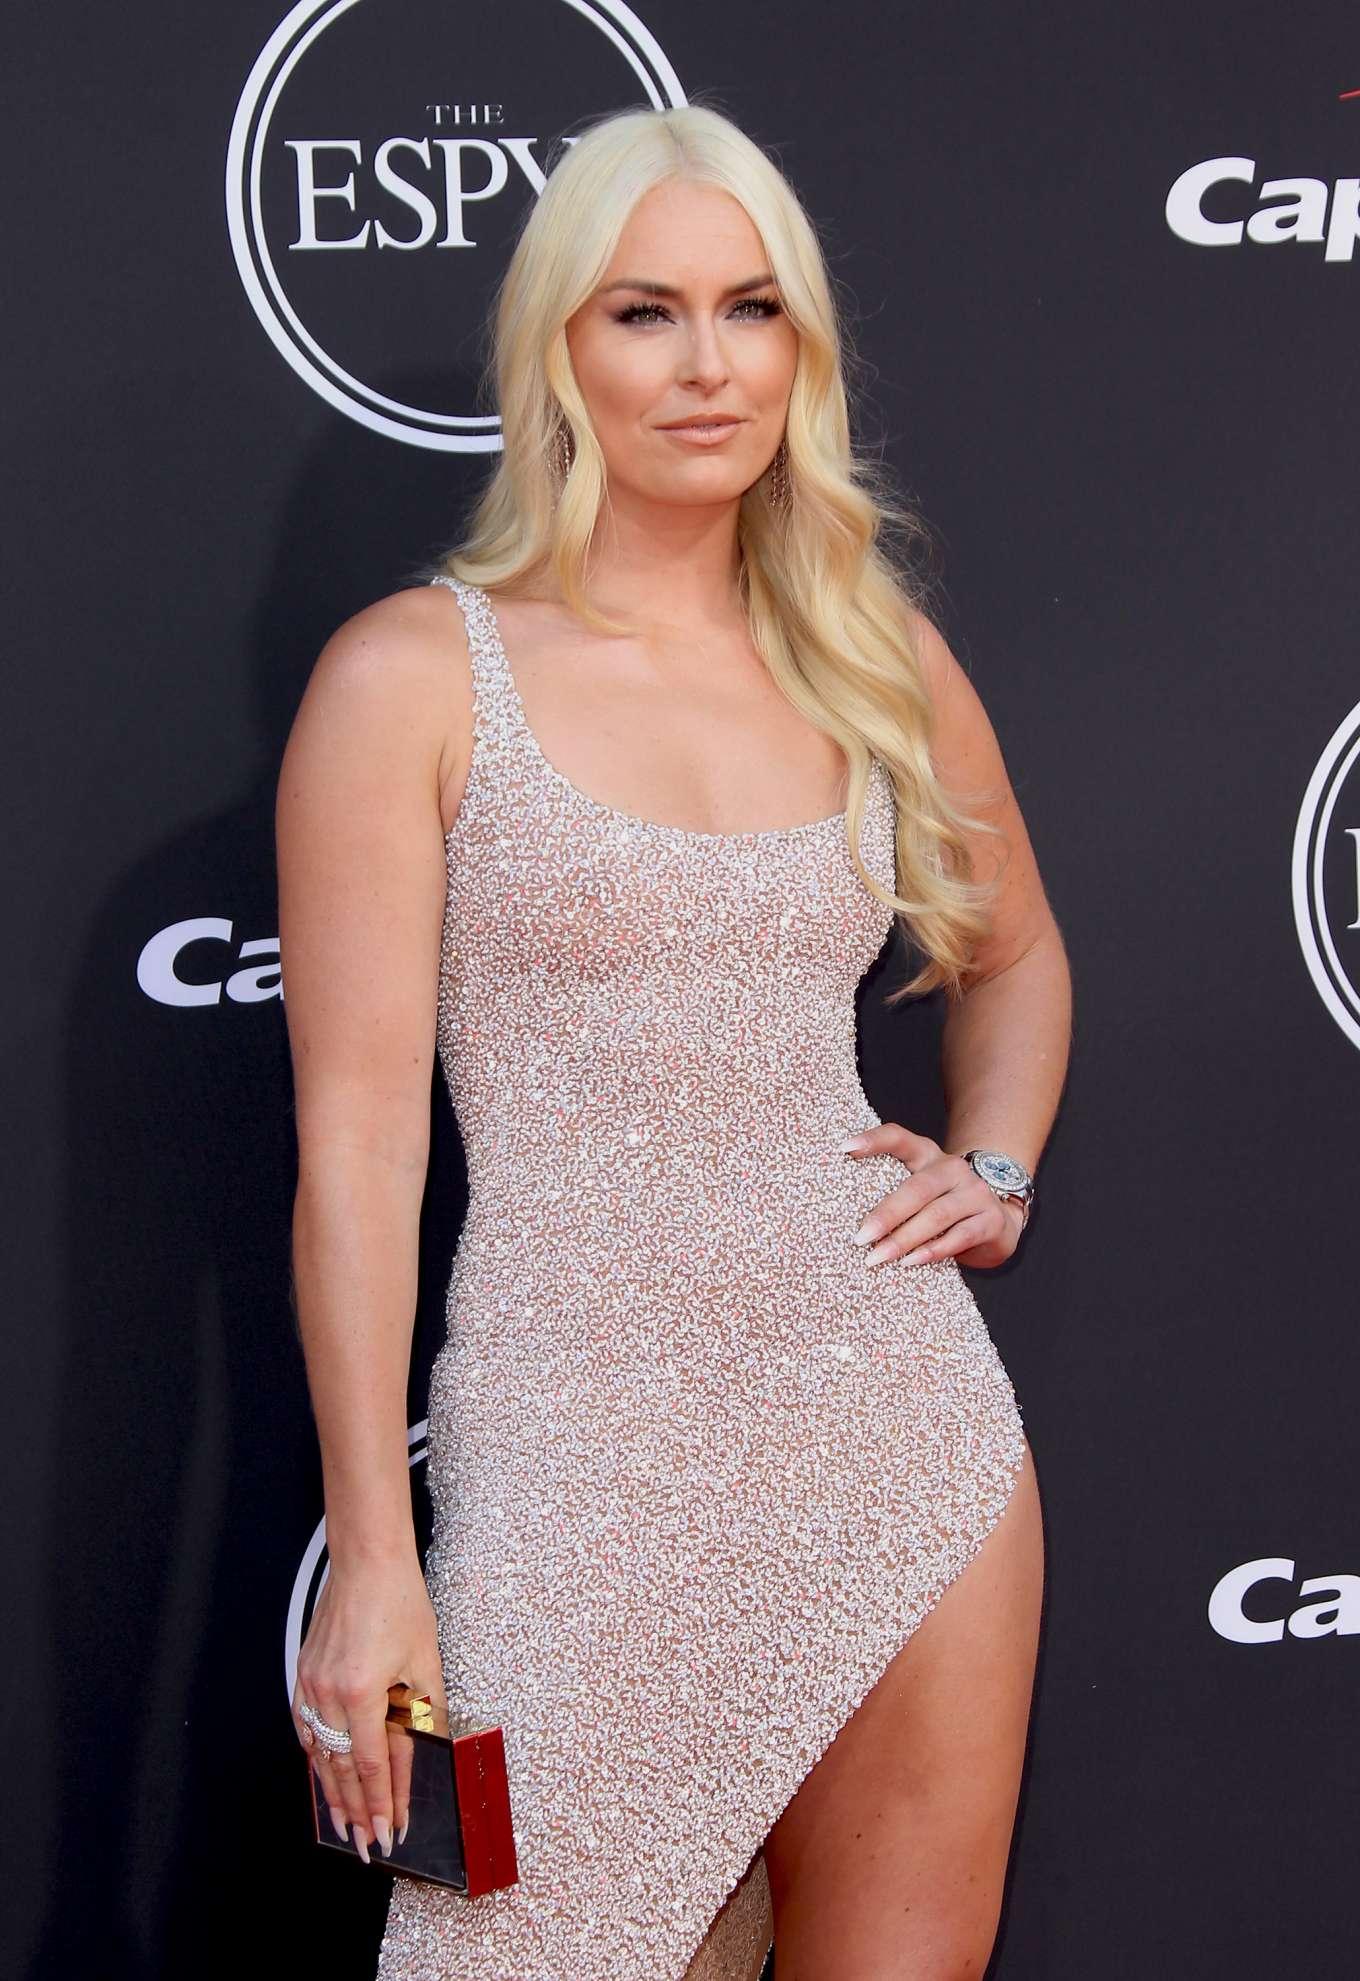 Lindsey Vonn - ESPYS 2019 Awards in Los Angeles